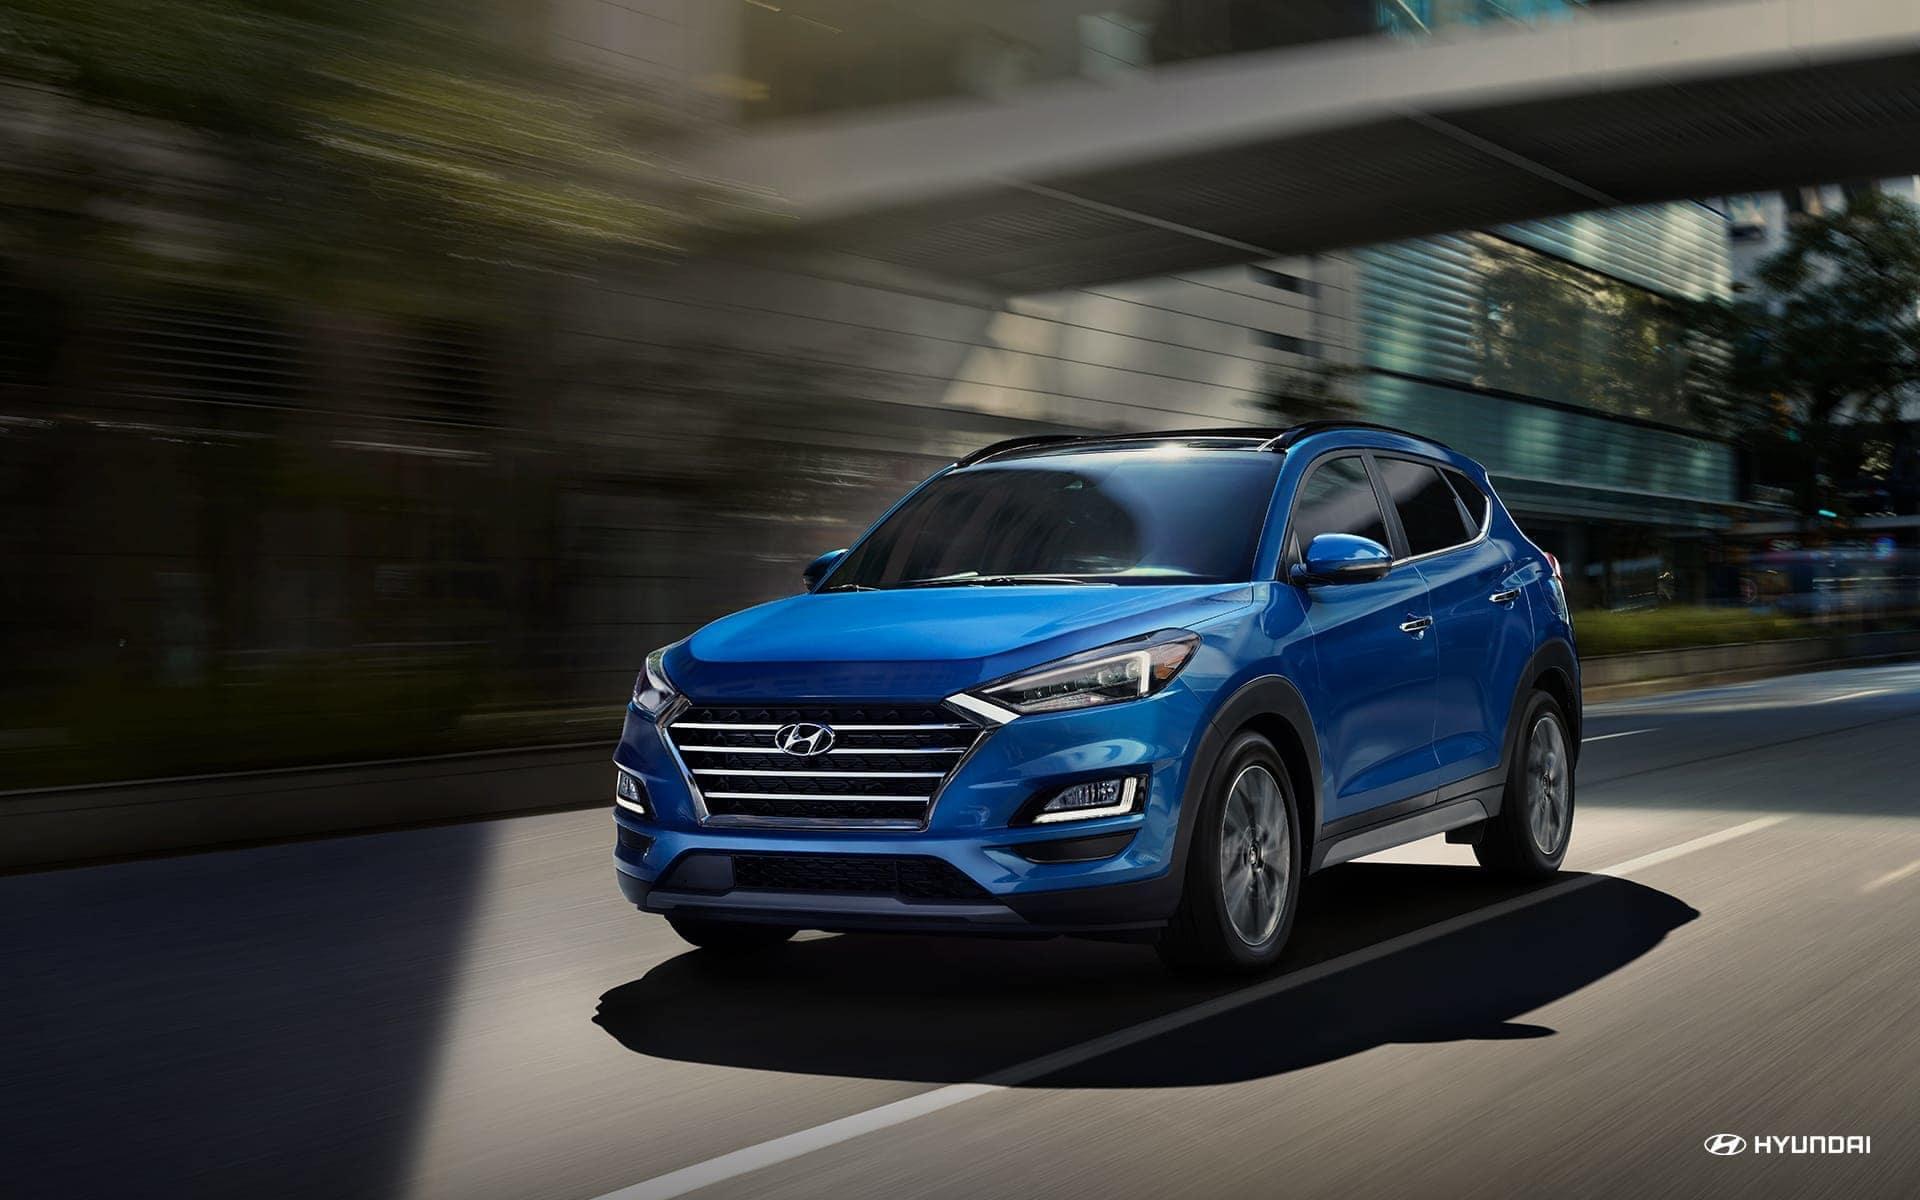 2019-Hyundai-Tucson-driving-down-road